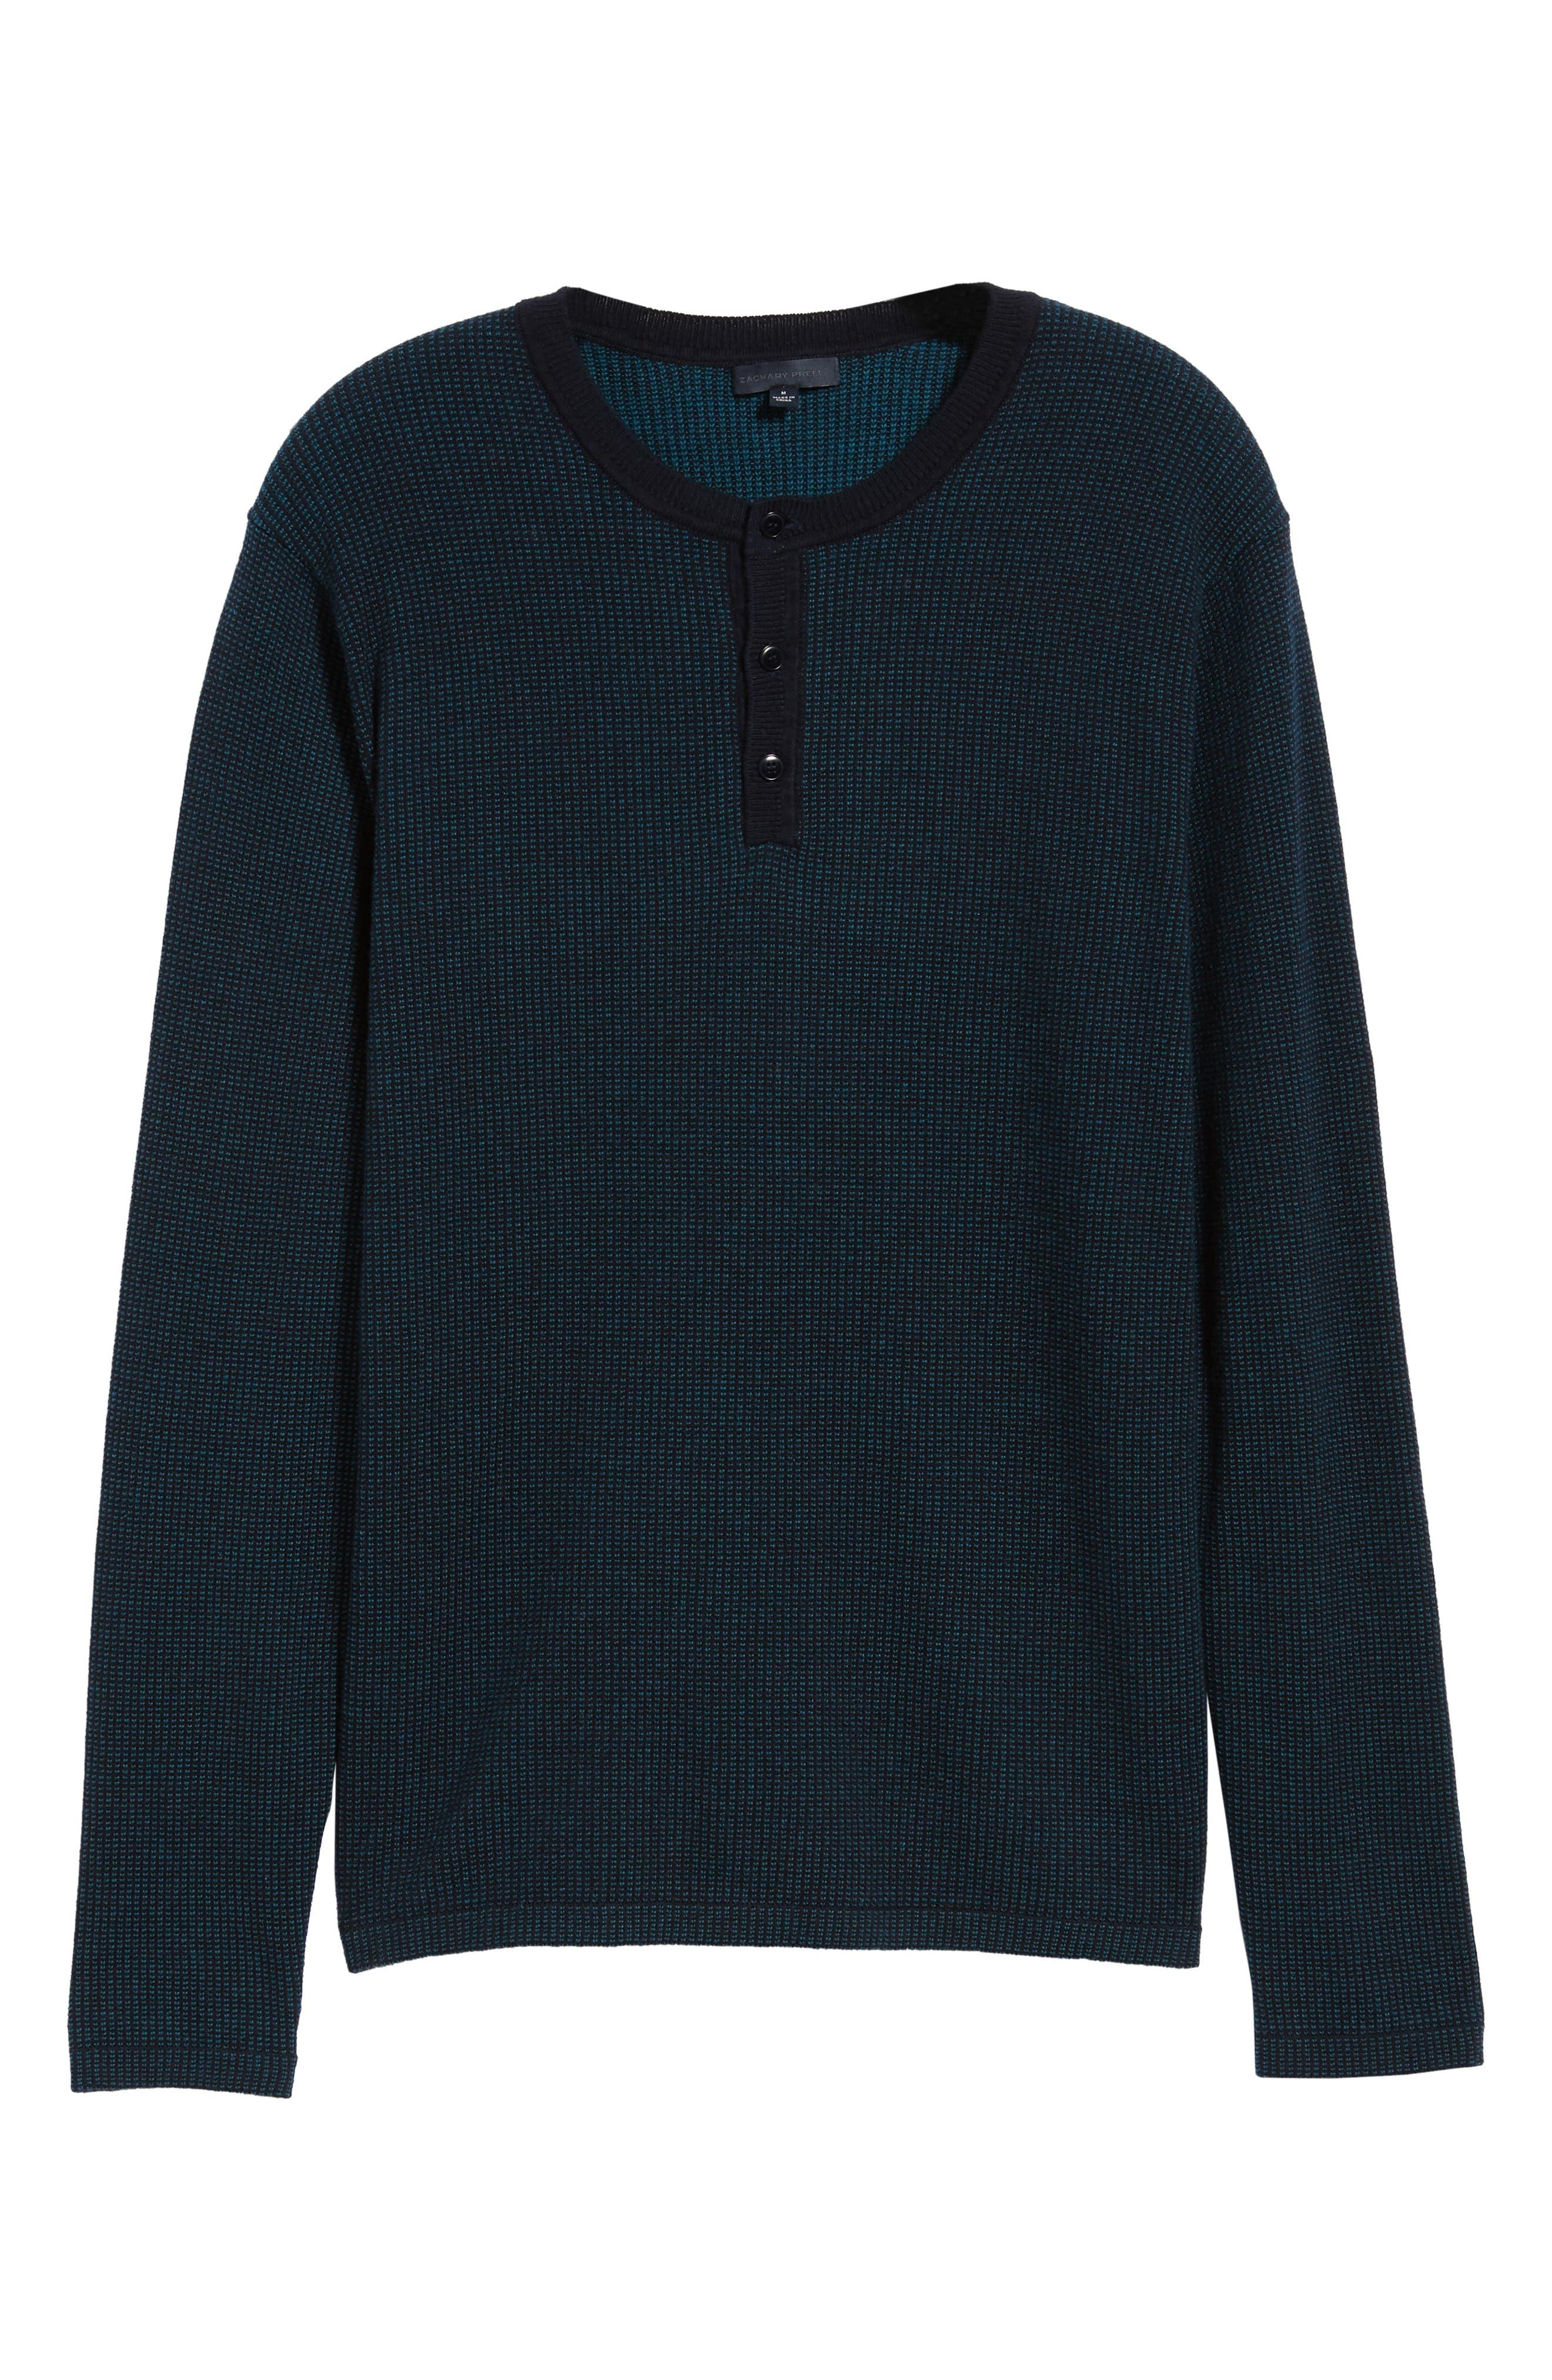 ZACHARY PRELL, Kimball Henley Sweater, Alternate thumbnail 6, color, EMERALD